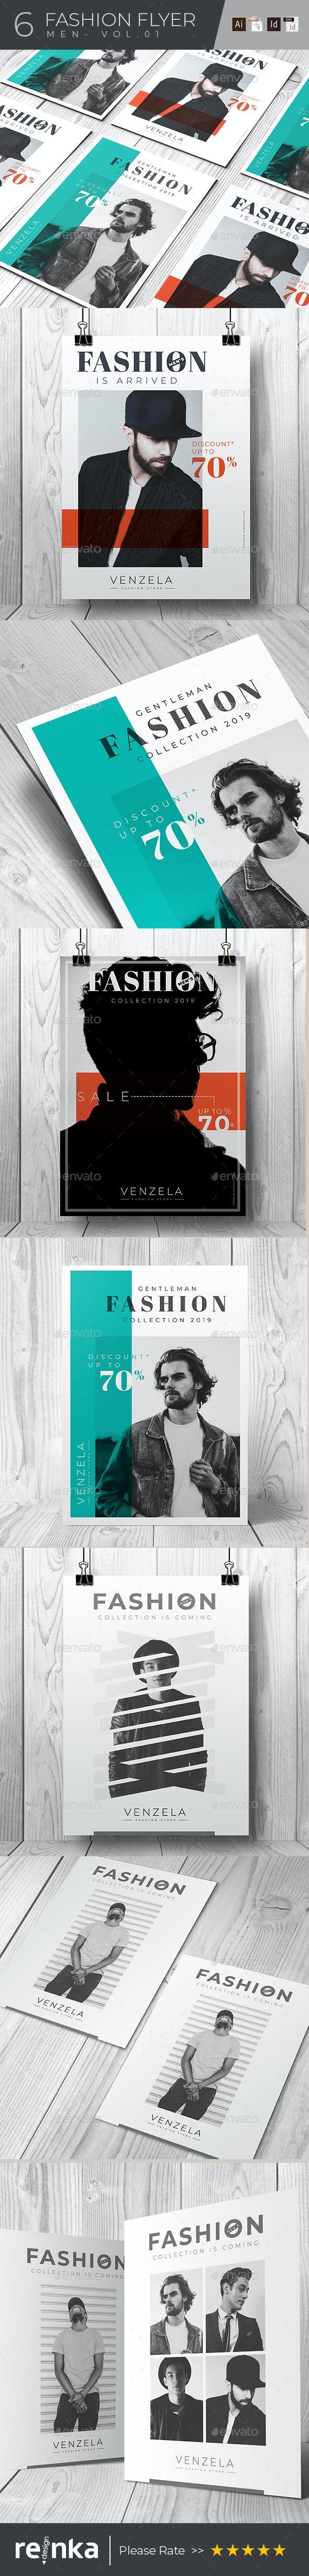 6 Fashion Flyer - Vol.02 - Events Flyers